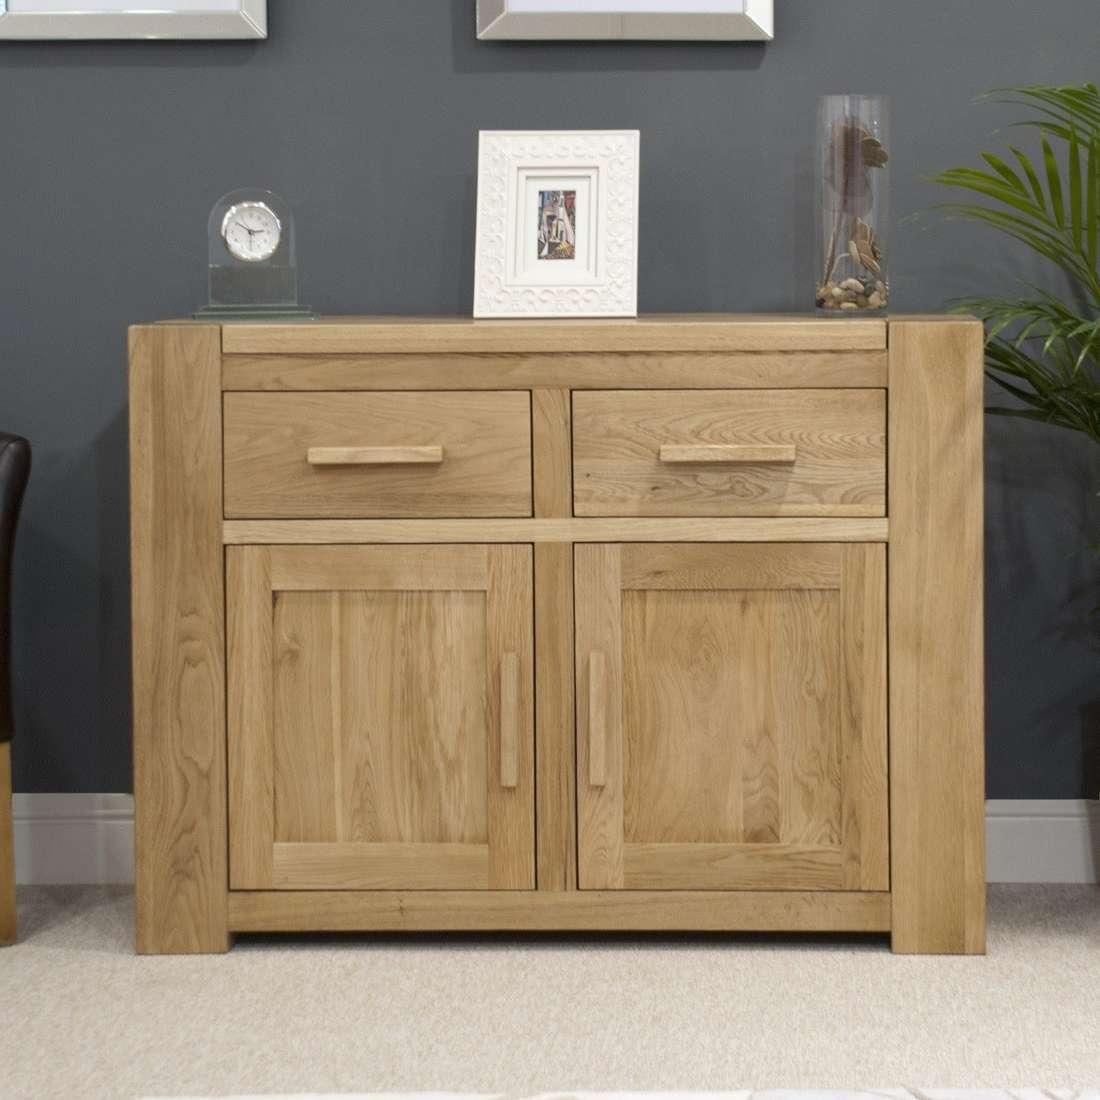 Trend Solid Oak Small 2 Door Sideboard | Oak Furniture Uk Within Sideboards Furniture (View 2 of 20)